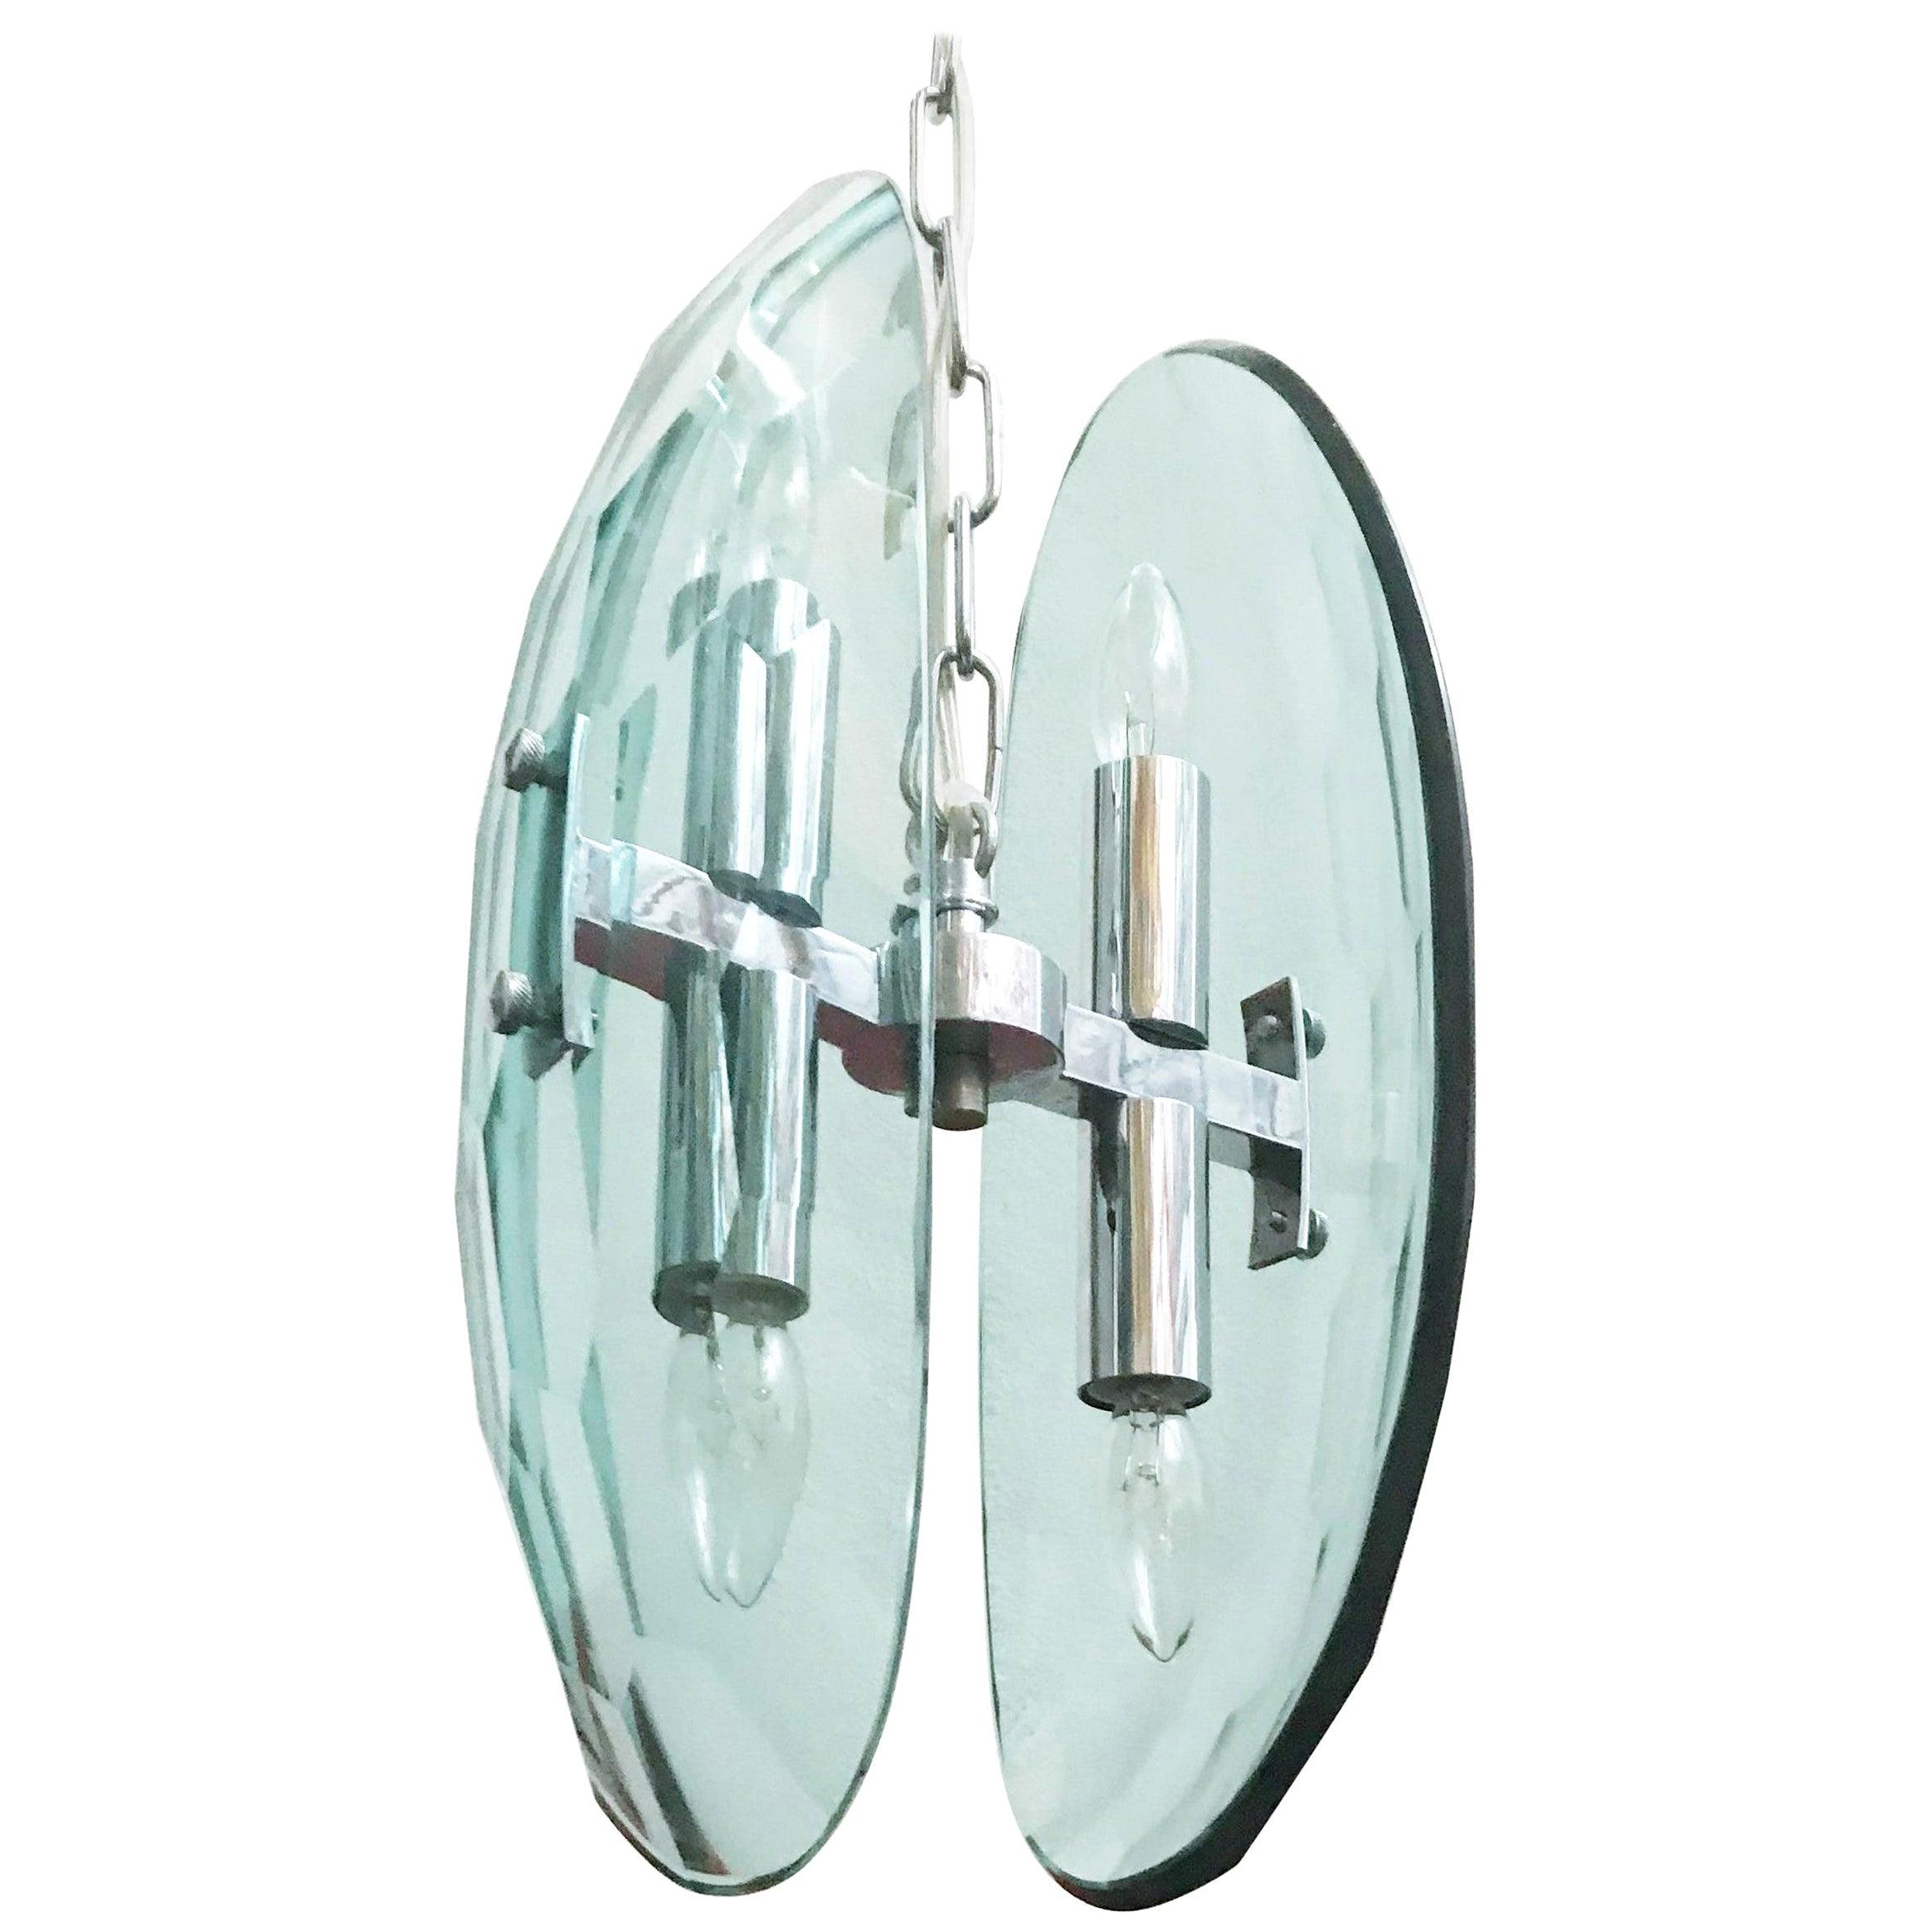 Vintage Italian Pendant w/ Beveled Glass by Cristal Arte, 1960s